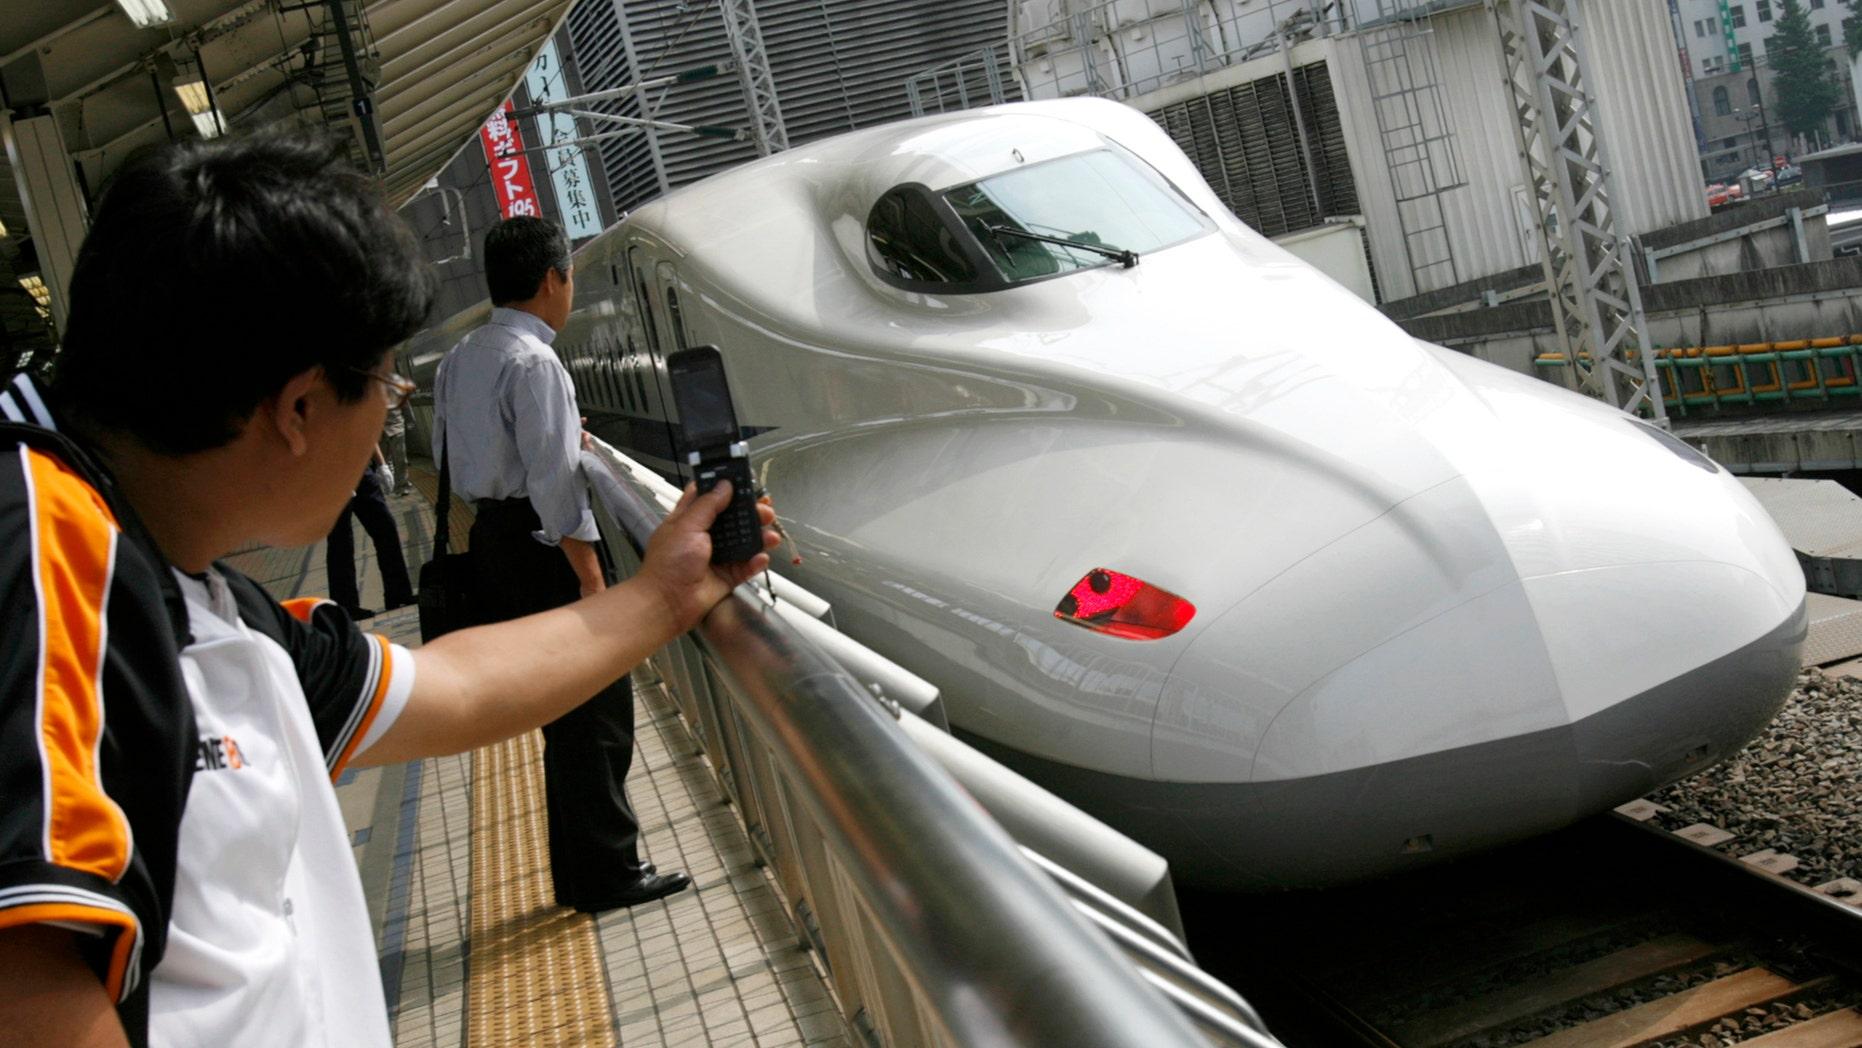 File photo - Men look at Japan Railway's N700 bullet train standing at a platform of Tokyo Station in Tokyo July 6, 2007.